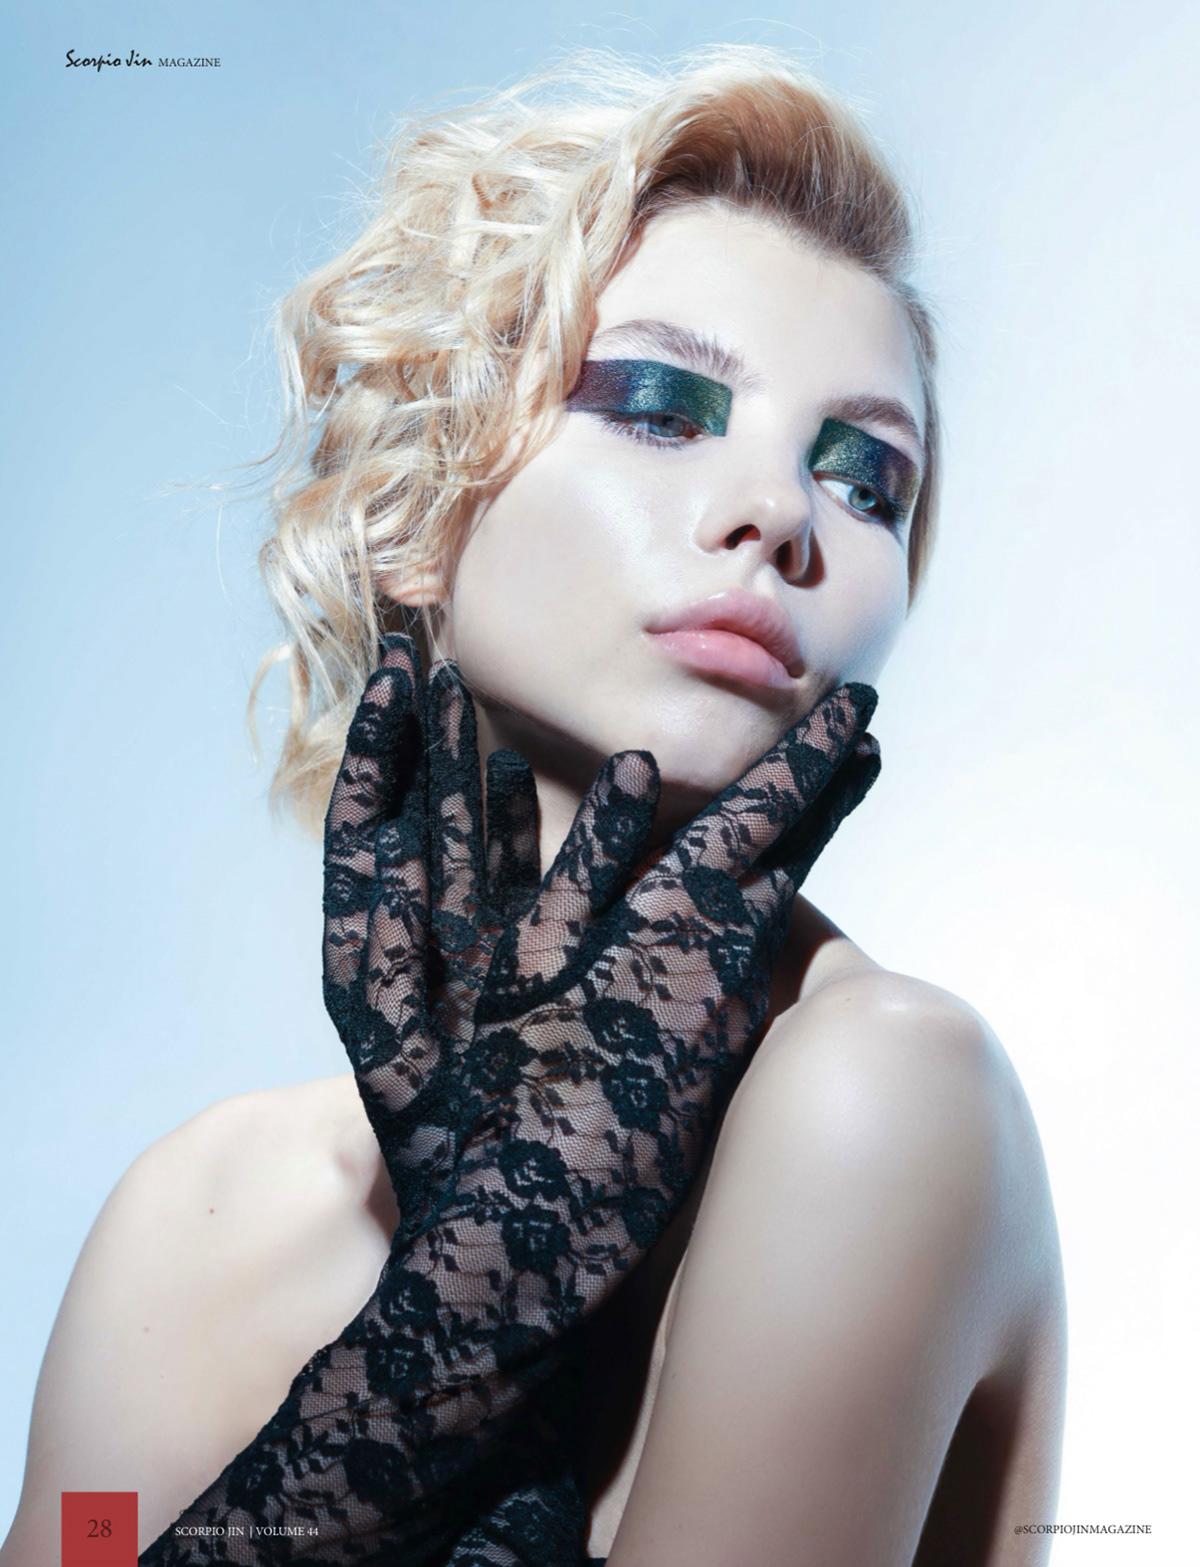 art cairo editorial egypt makeup MUA Photography